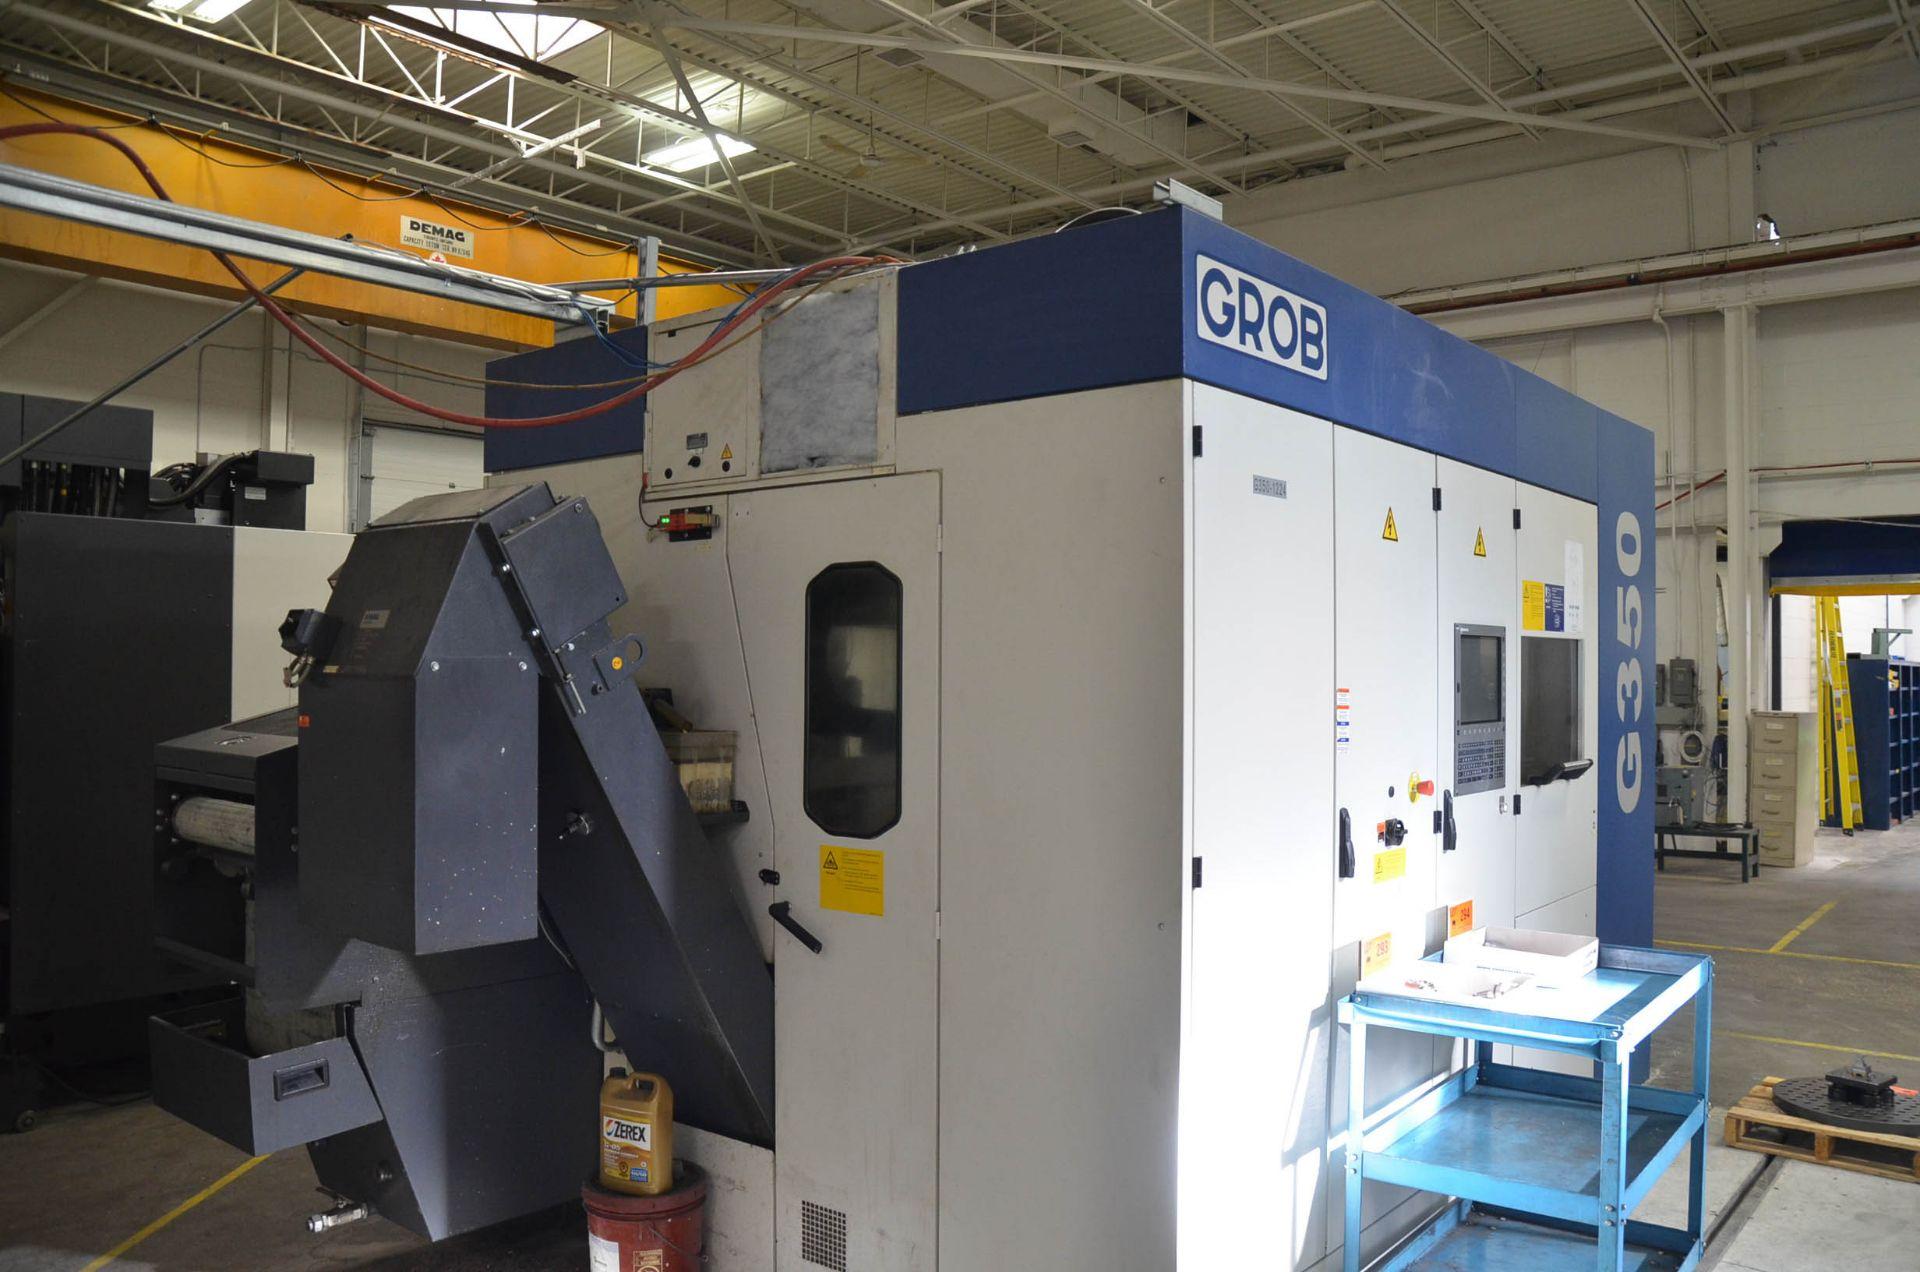 "GROB (2012) G350 5-AXIS CNC MACHINING CENTER WITH HEIDENHAIN ITNC 530 CNC CONTROL, 22.25"" DIAMETER - Image 10 of 12"